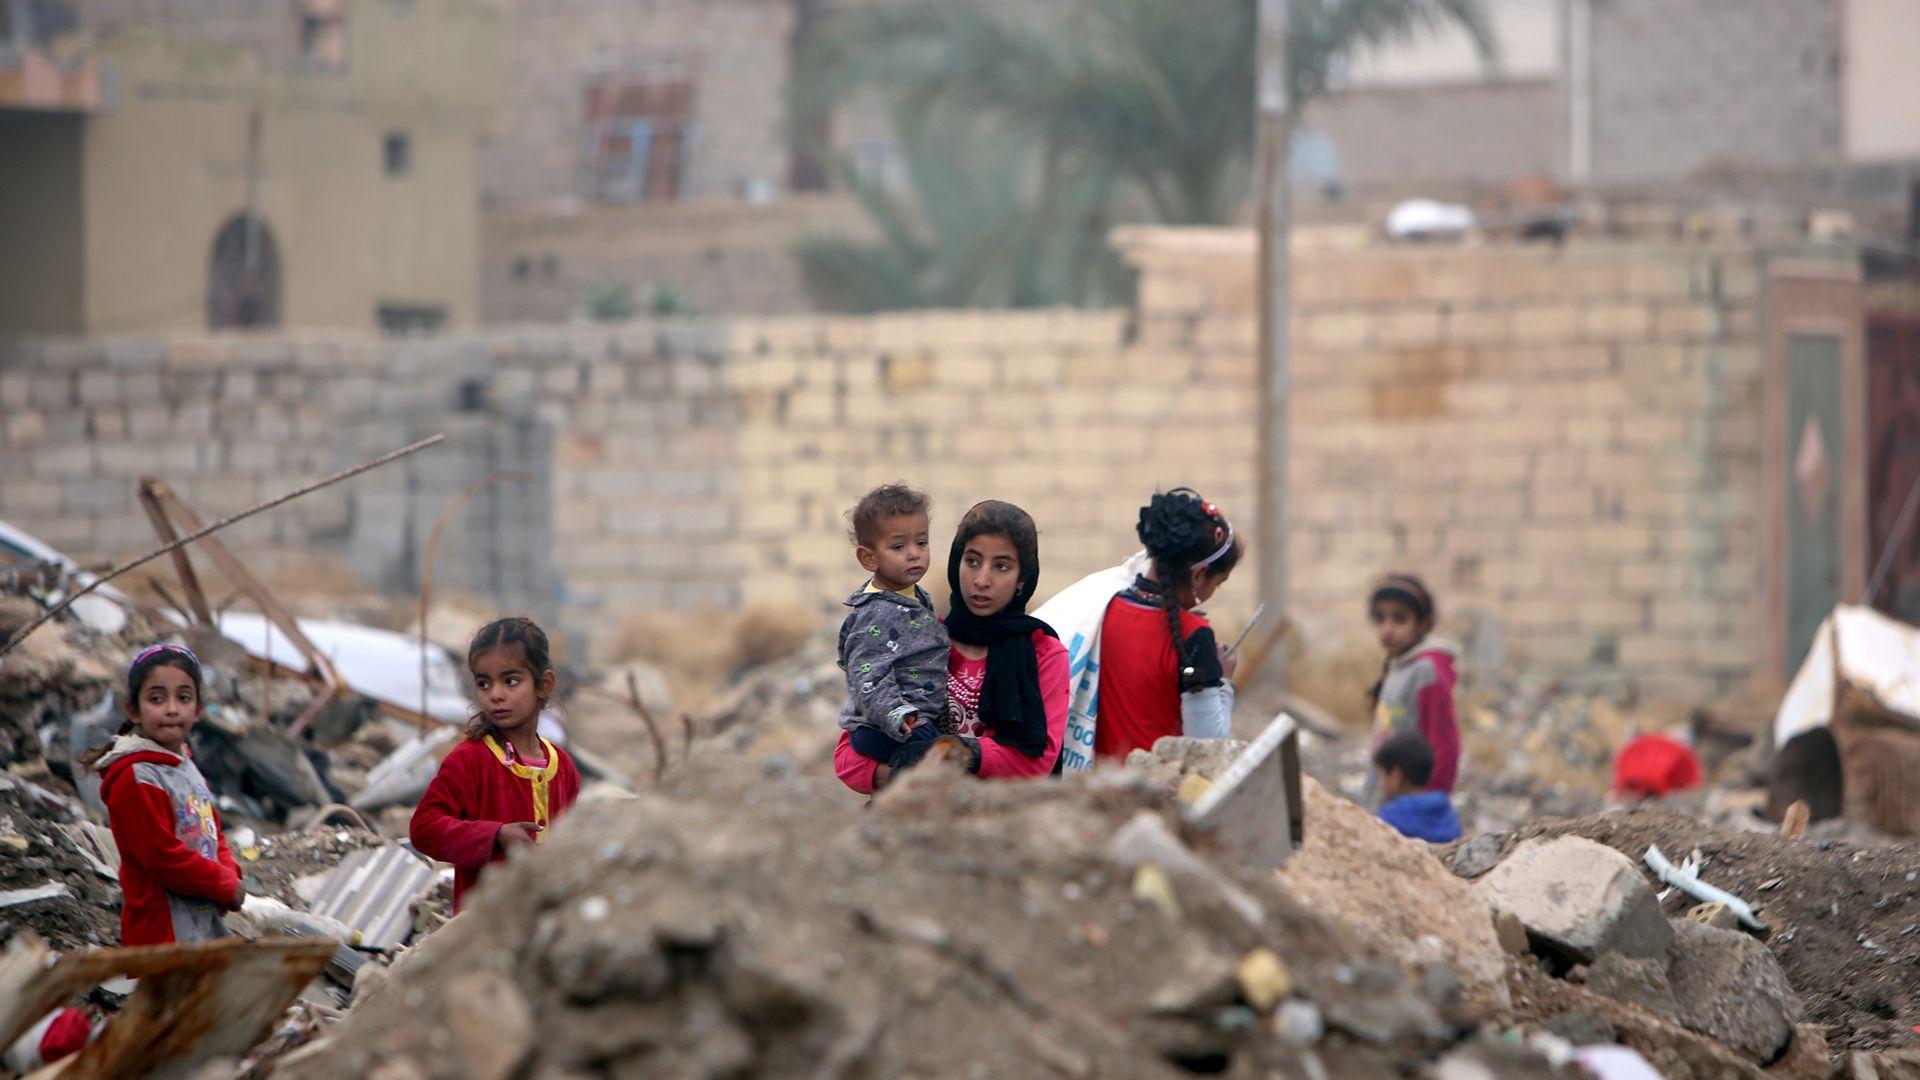 Children stand amid rubble in Fallujah, Iraq.